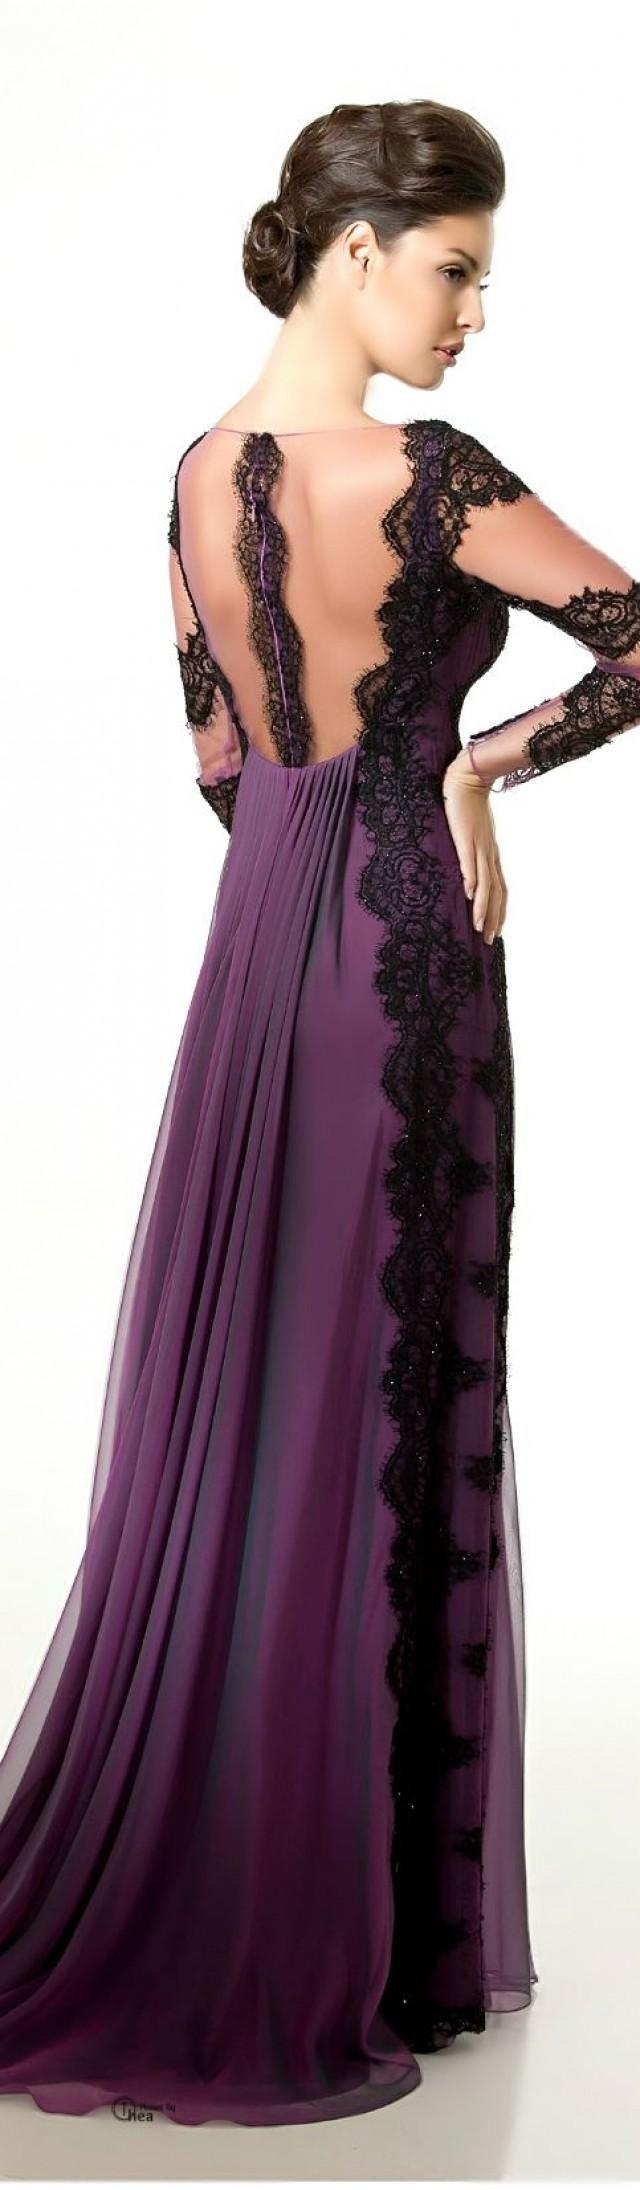 11 best vestidos images on Pinterest   Curve dresses, Evening gowns ...